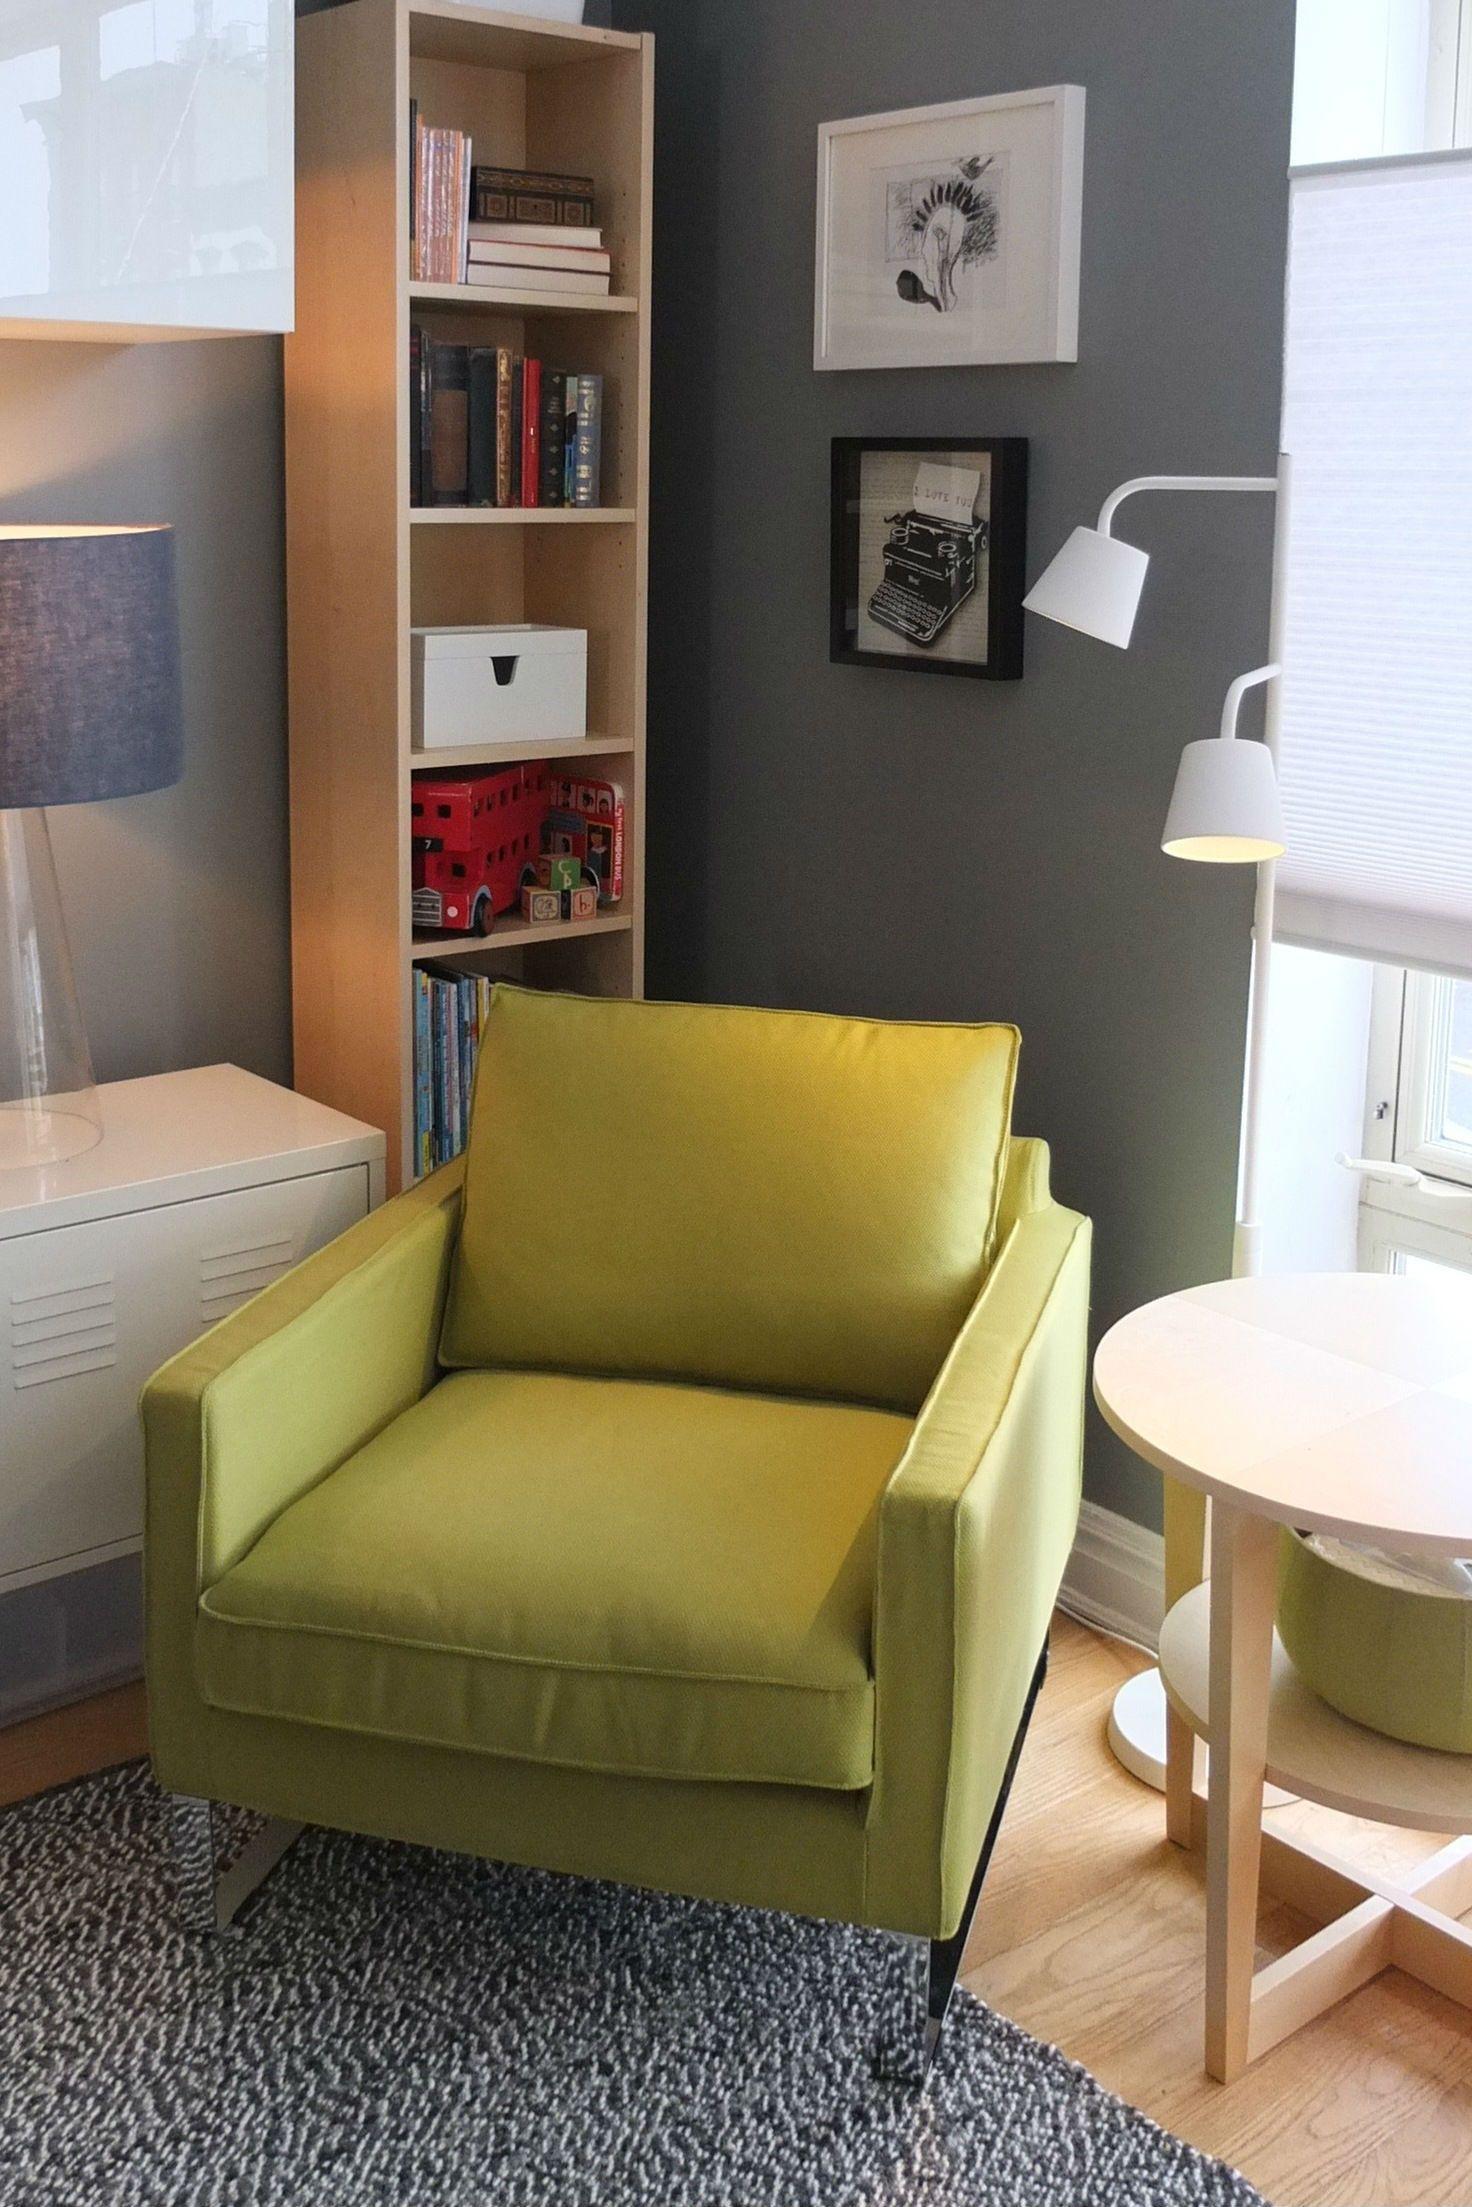 Tremendous Us Furniture And Home Furnishings Ikea Home Tour Evergreenethics Interior Chair Design Evergreenethicsorg